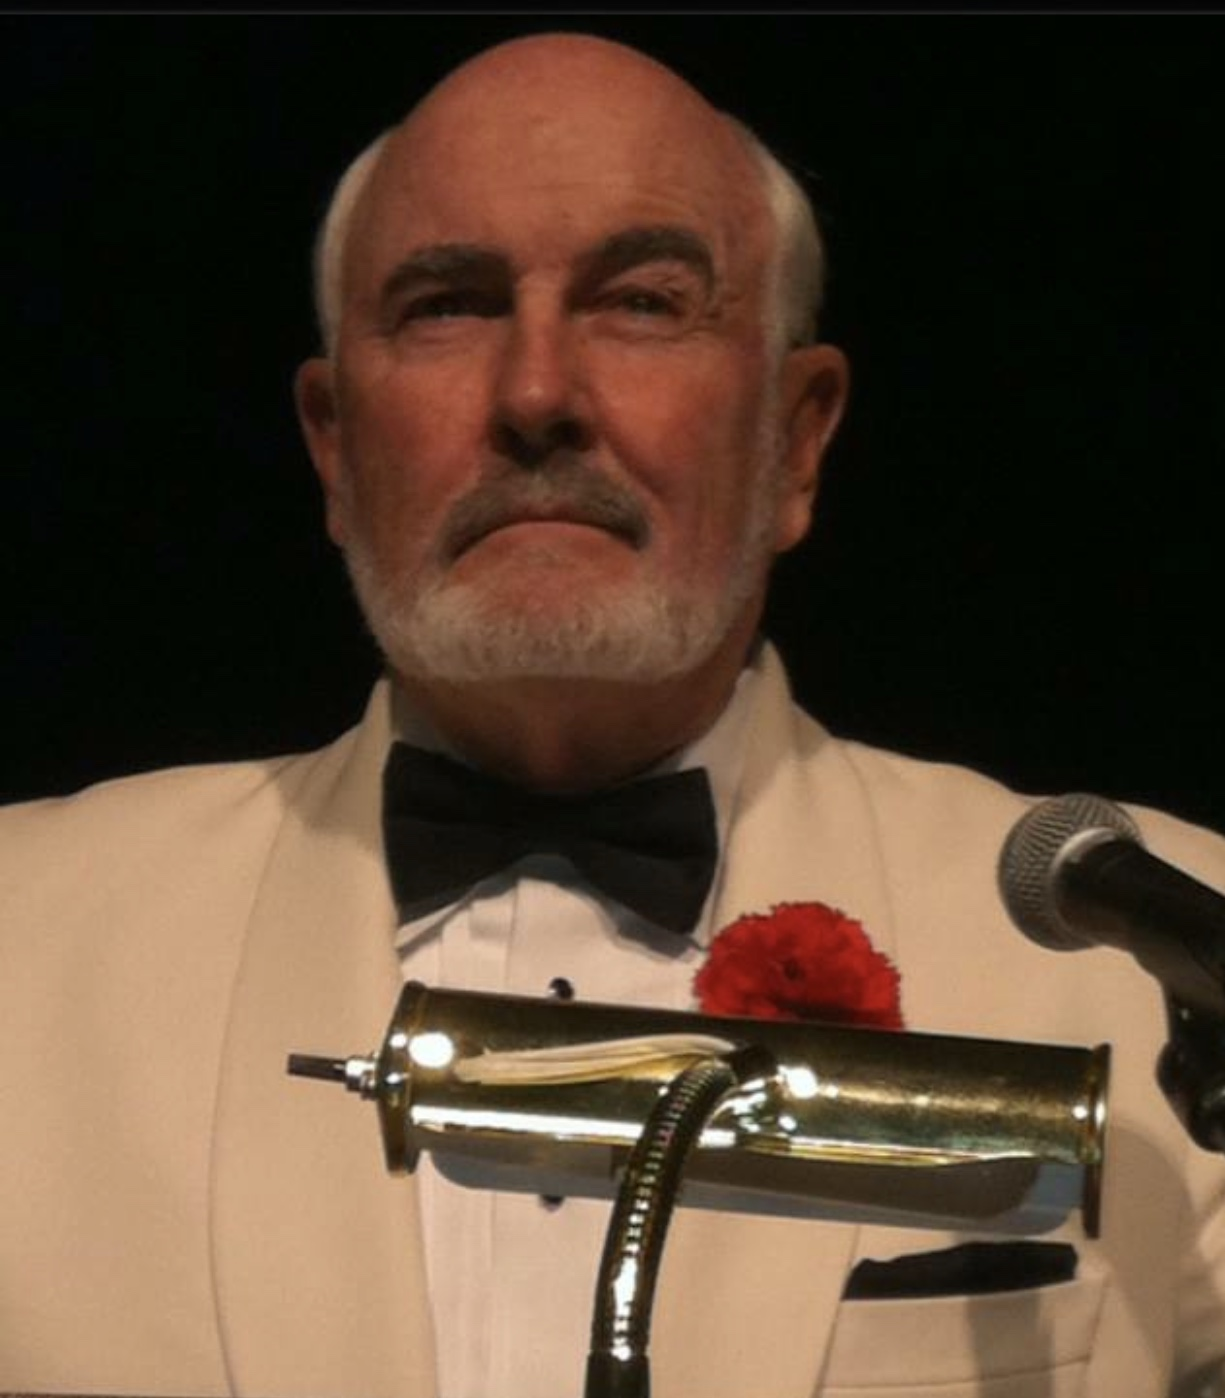 Sean Connery afbeeldingen Emcee for corporate event Las Vegas HD 1225x1398